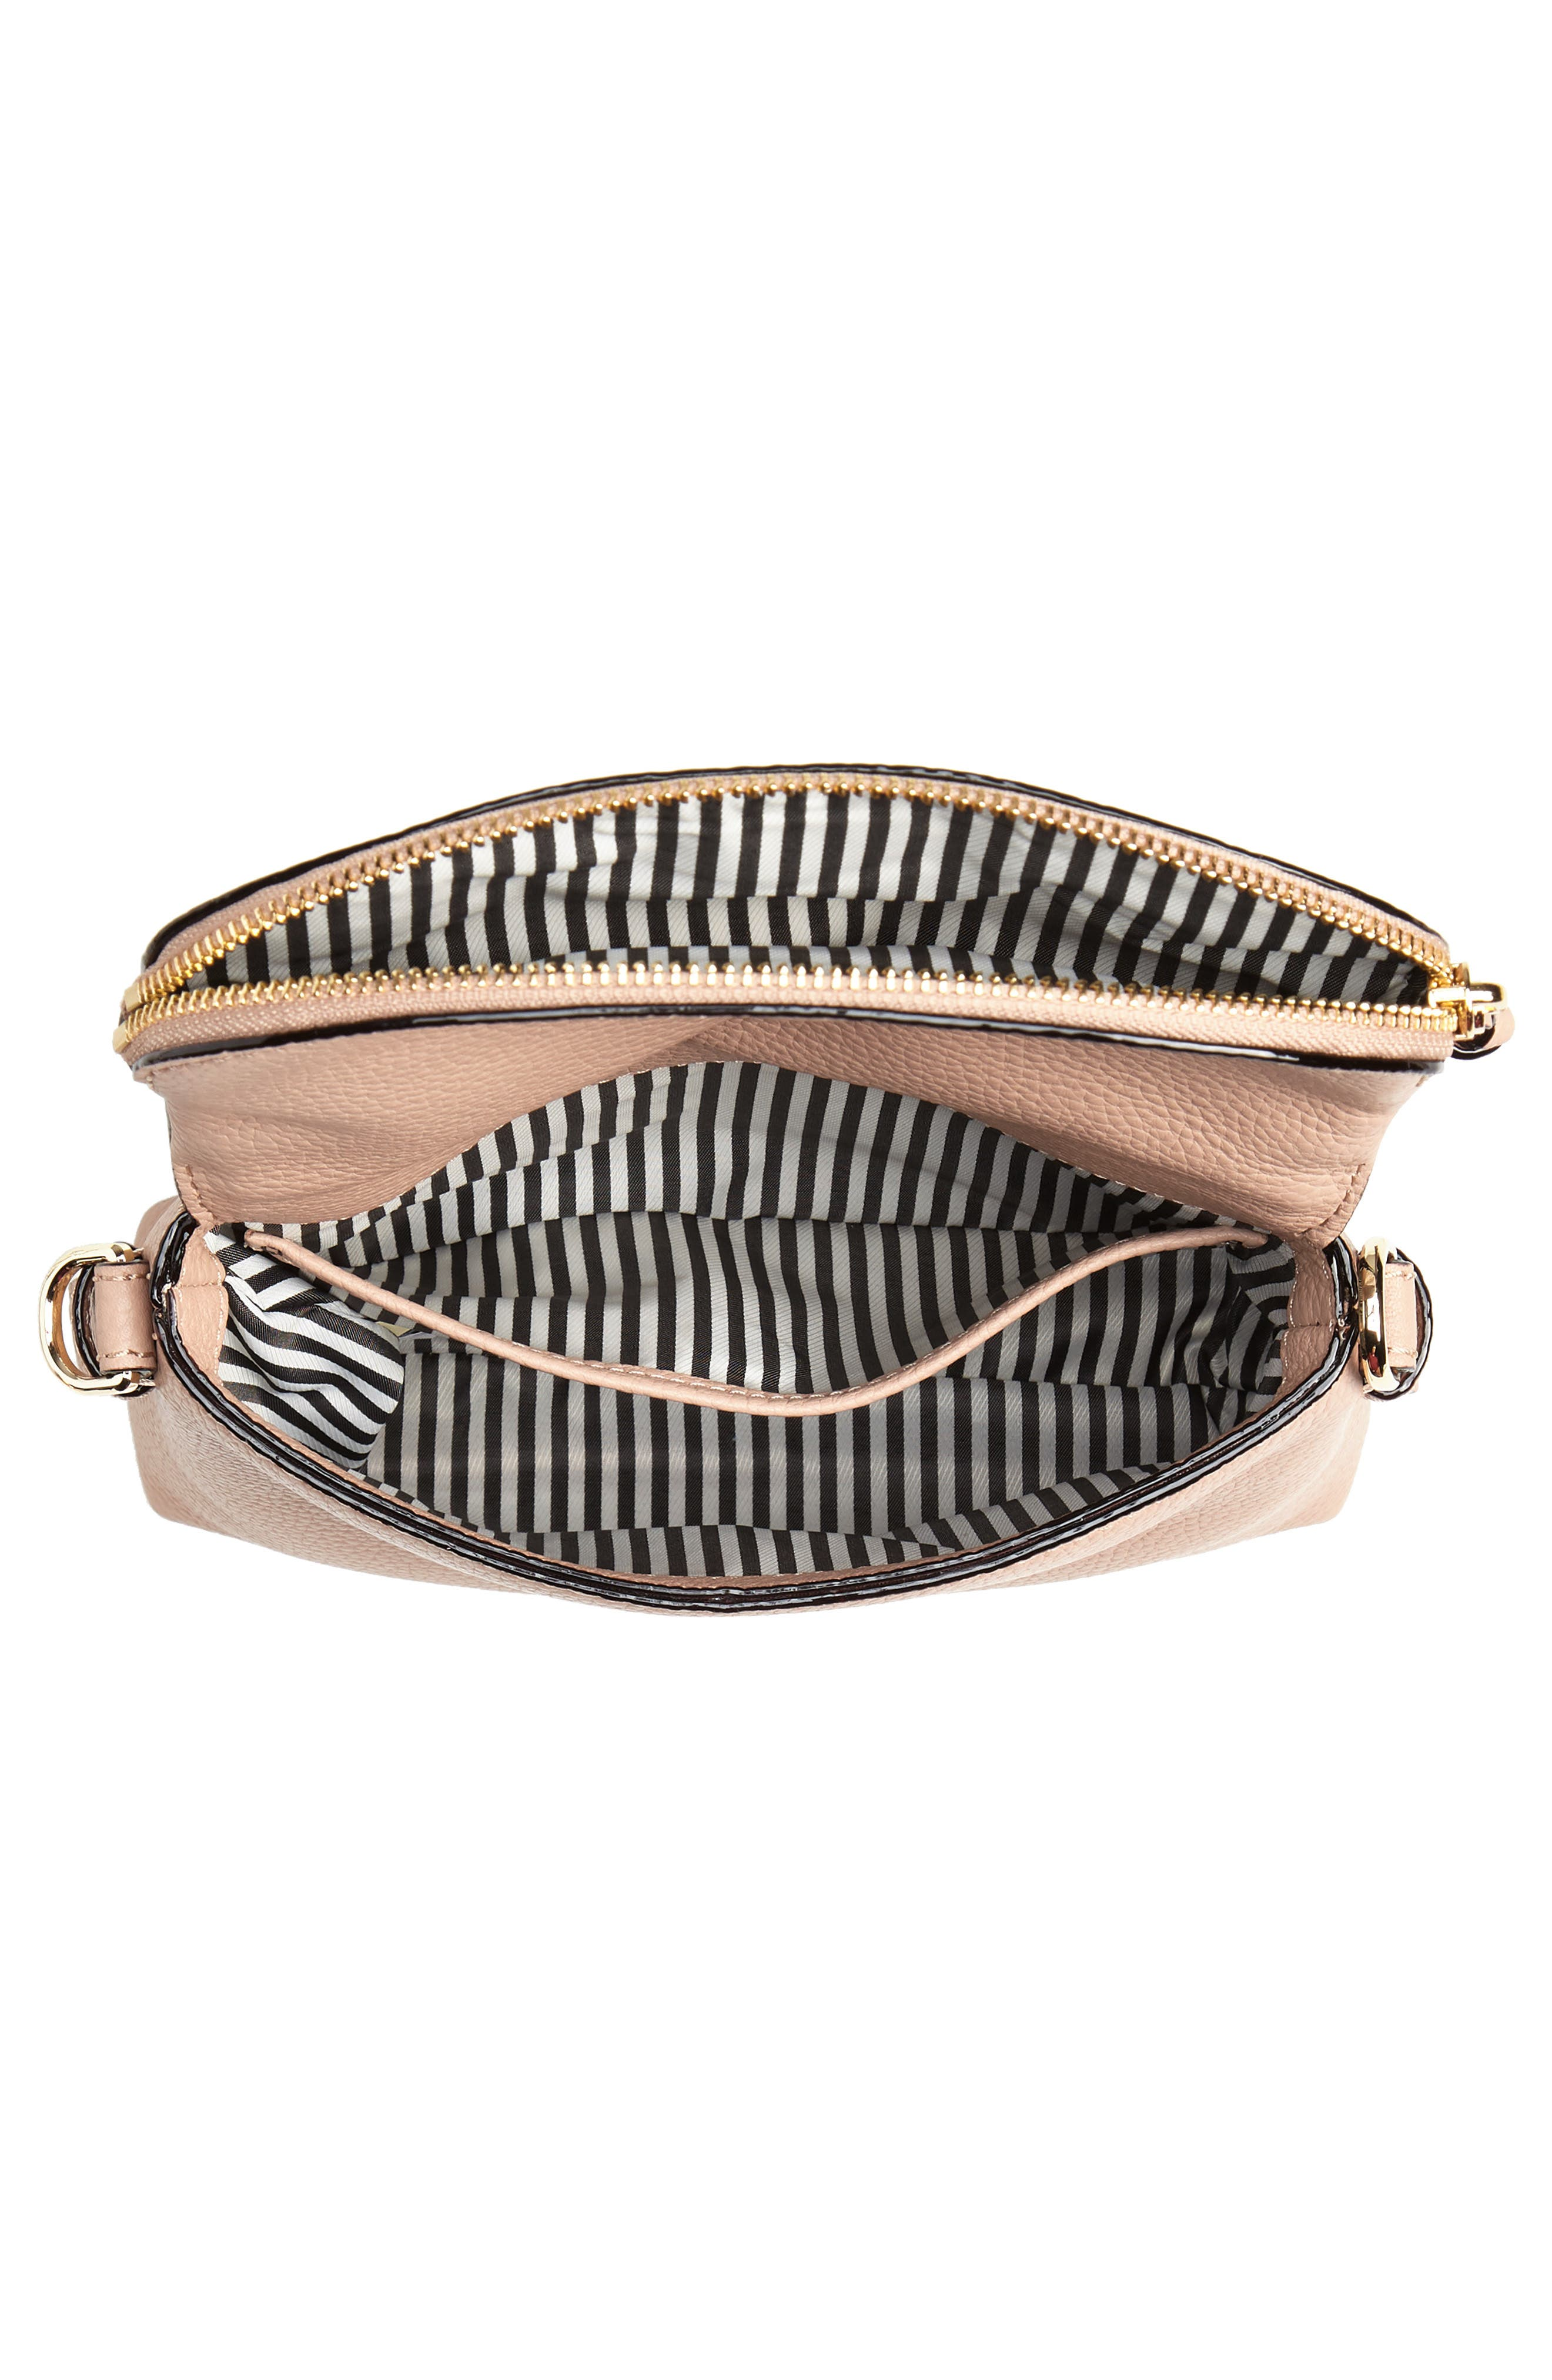 KATE SPADE NEW YORK,                             jackson street small harlyn leather crossbody bag,                             Alternate thumbnail 4, color,                             253